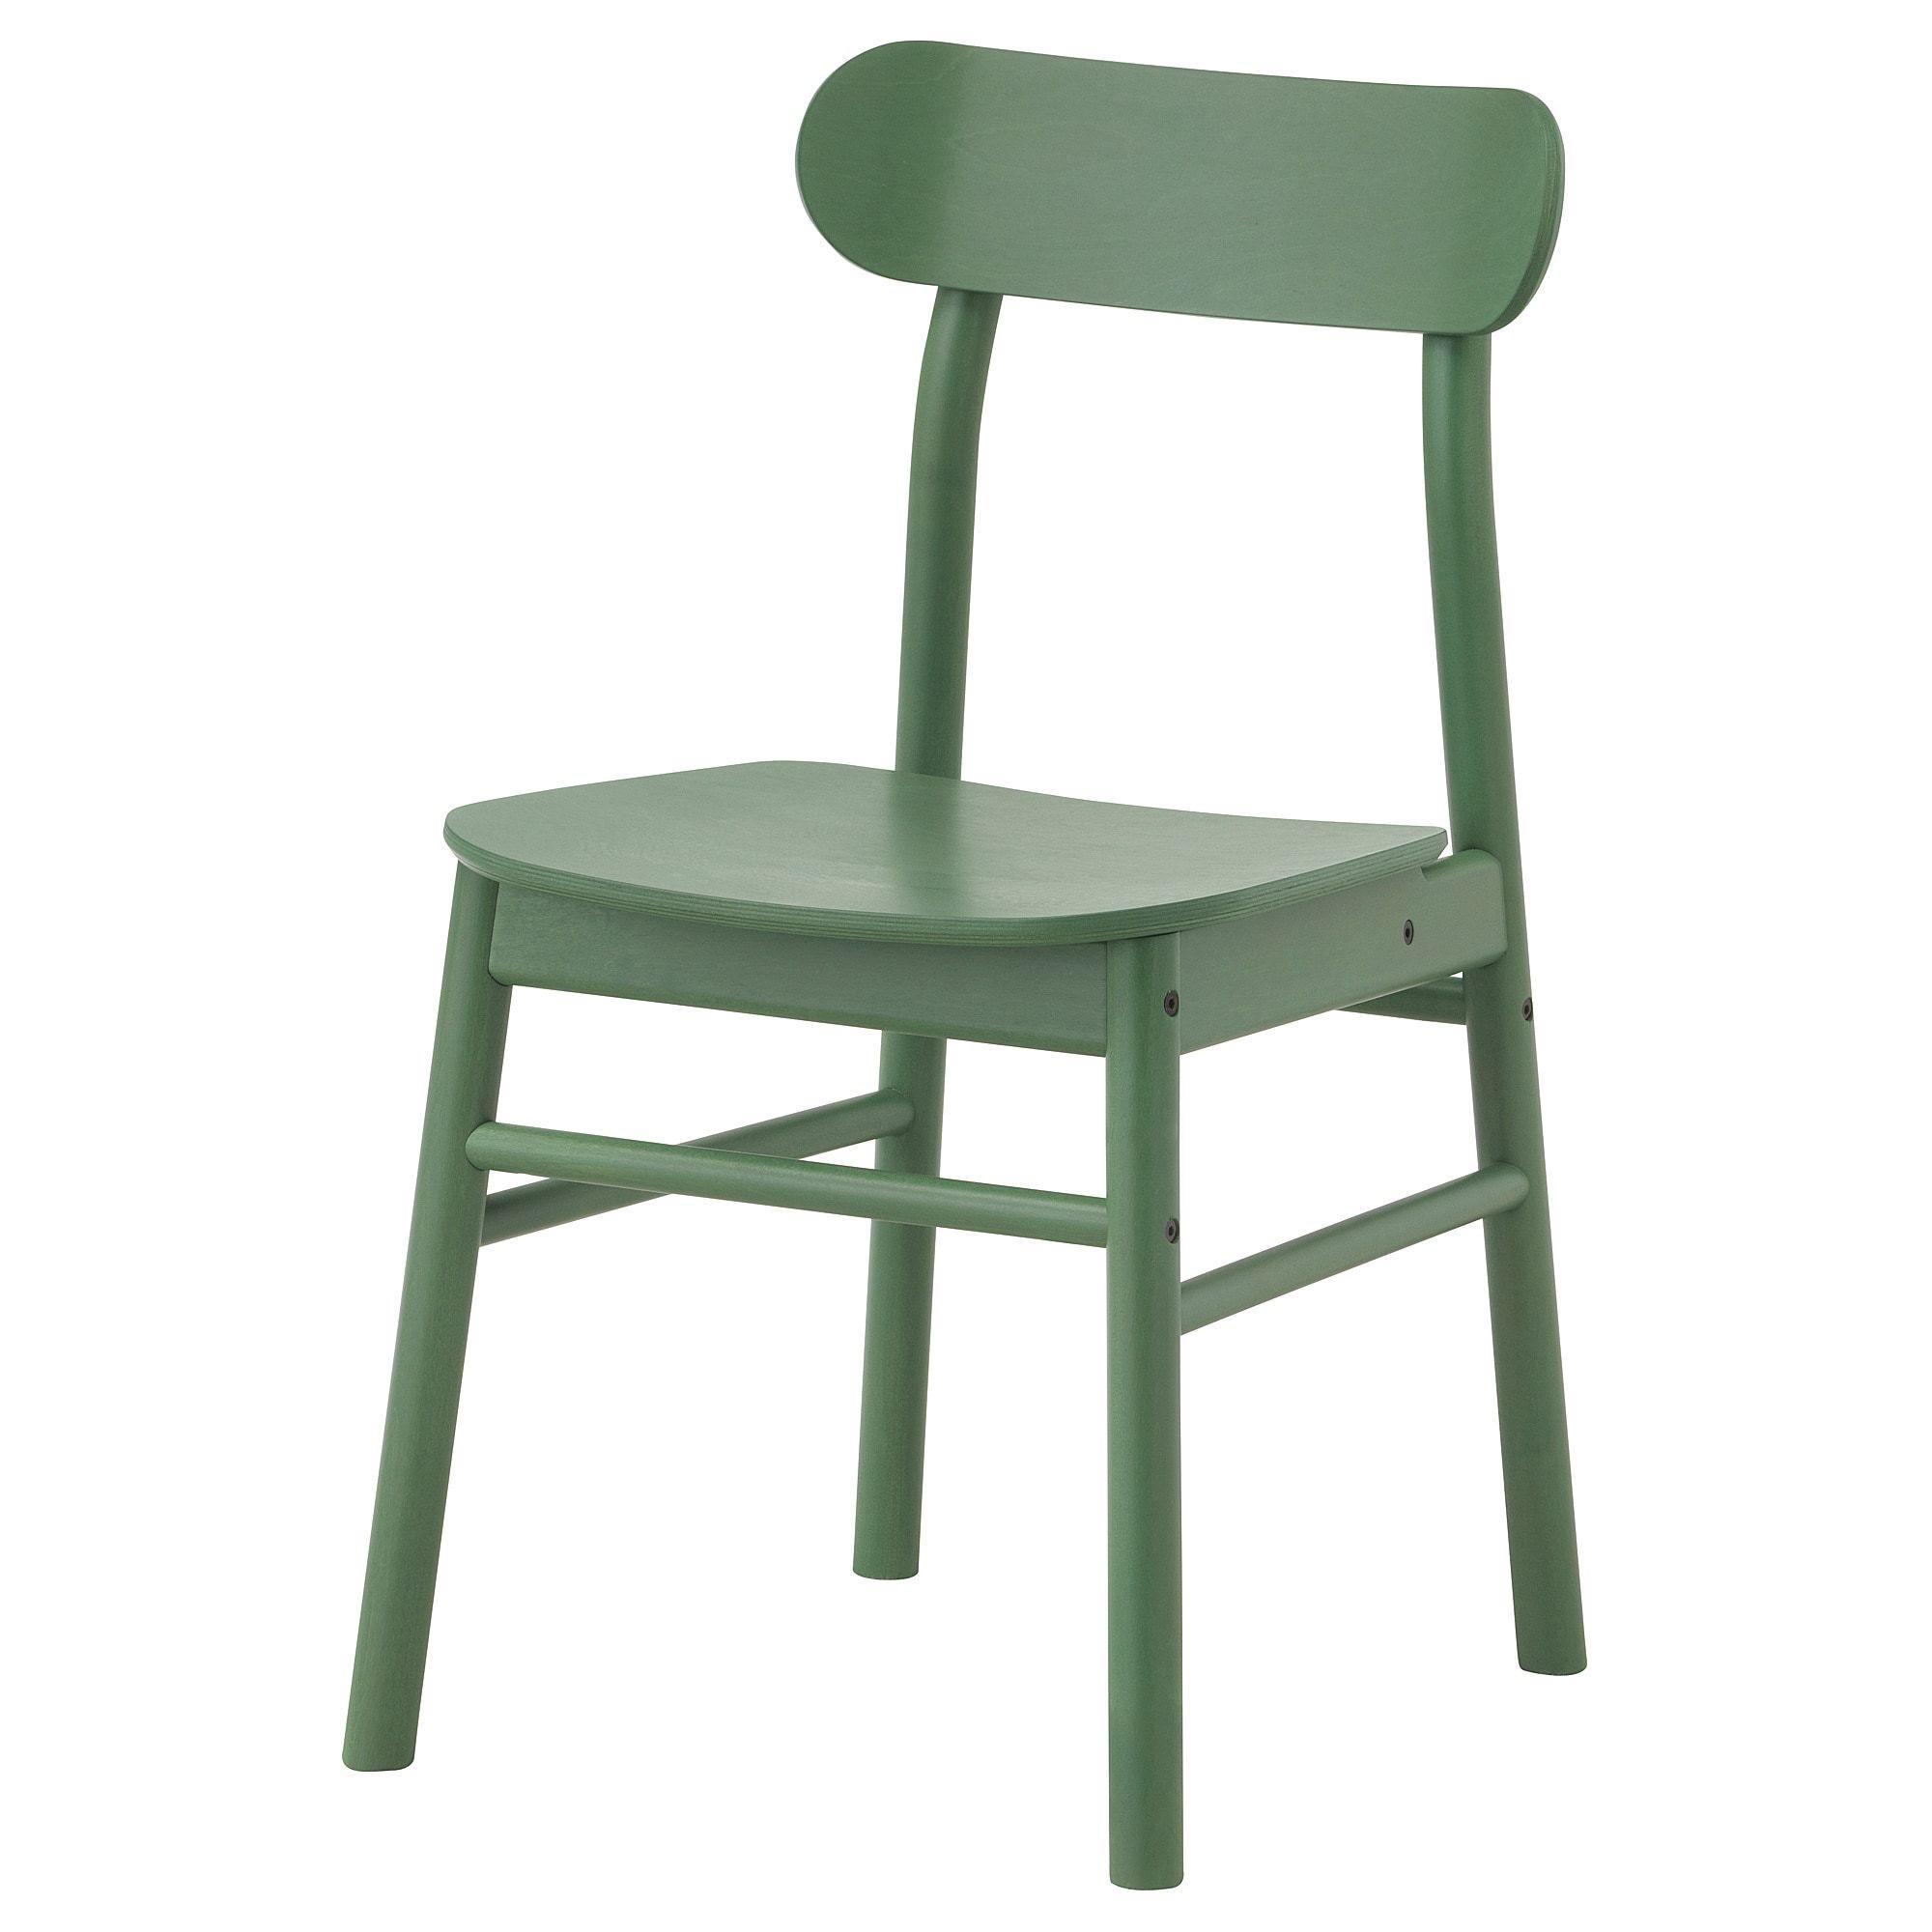 RÖNNINGE Chair, green IKEA Green chair, Modern wood